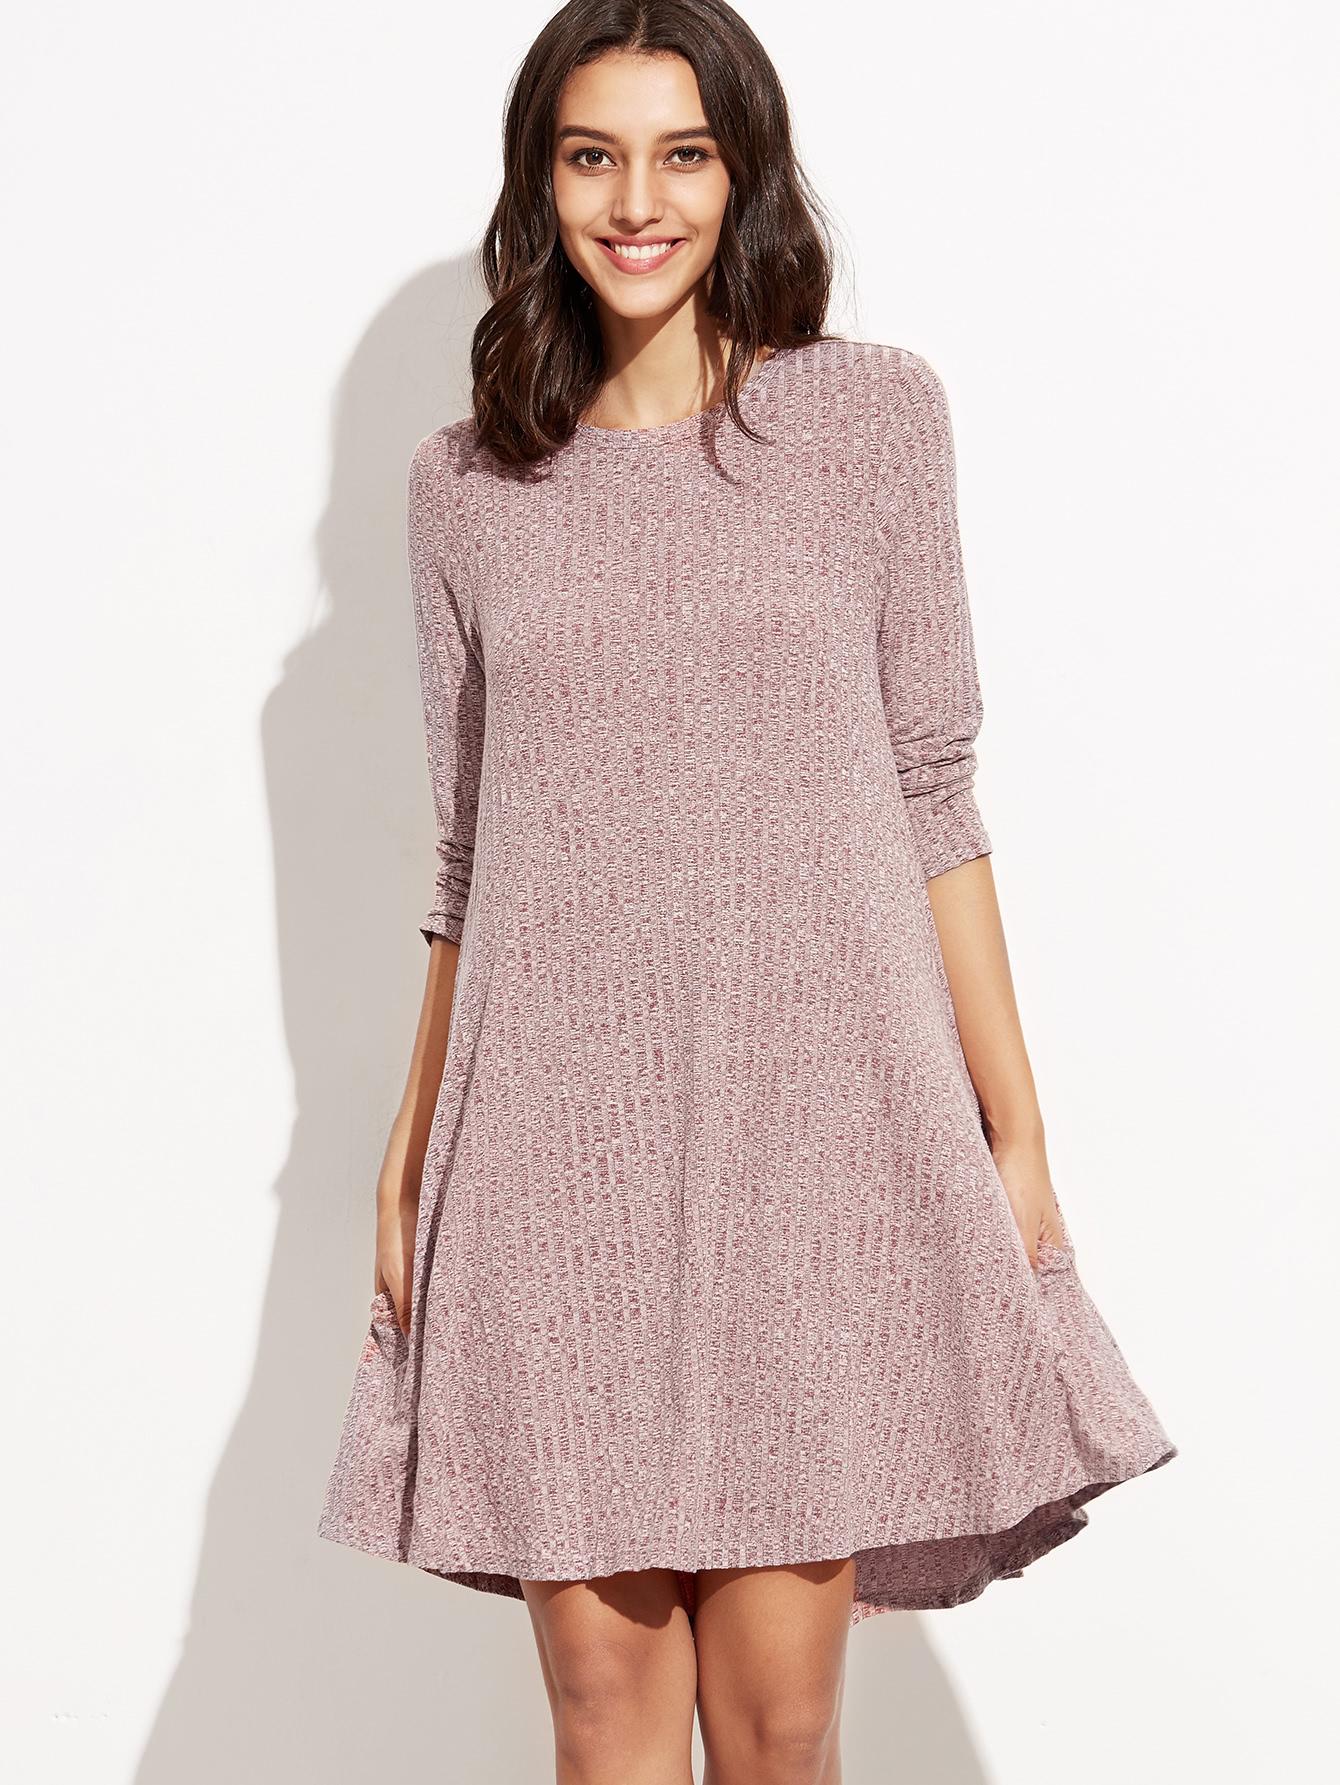 Burgundy Marled Knit Ribbed Swing Dress dress160830711